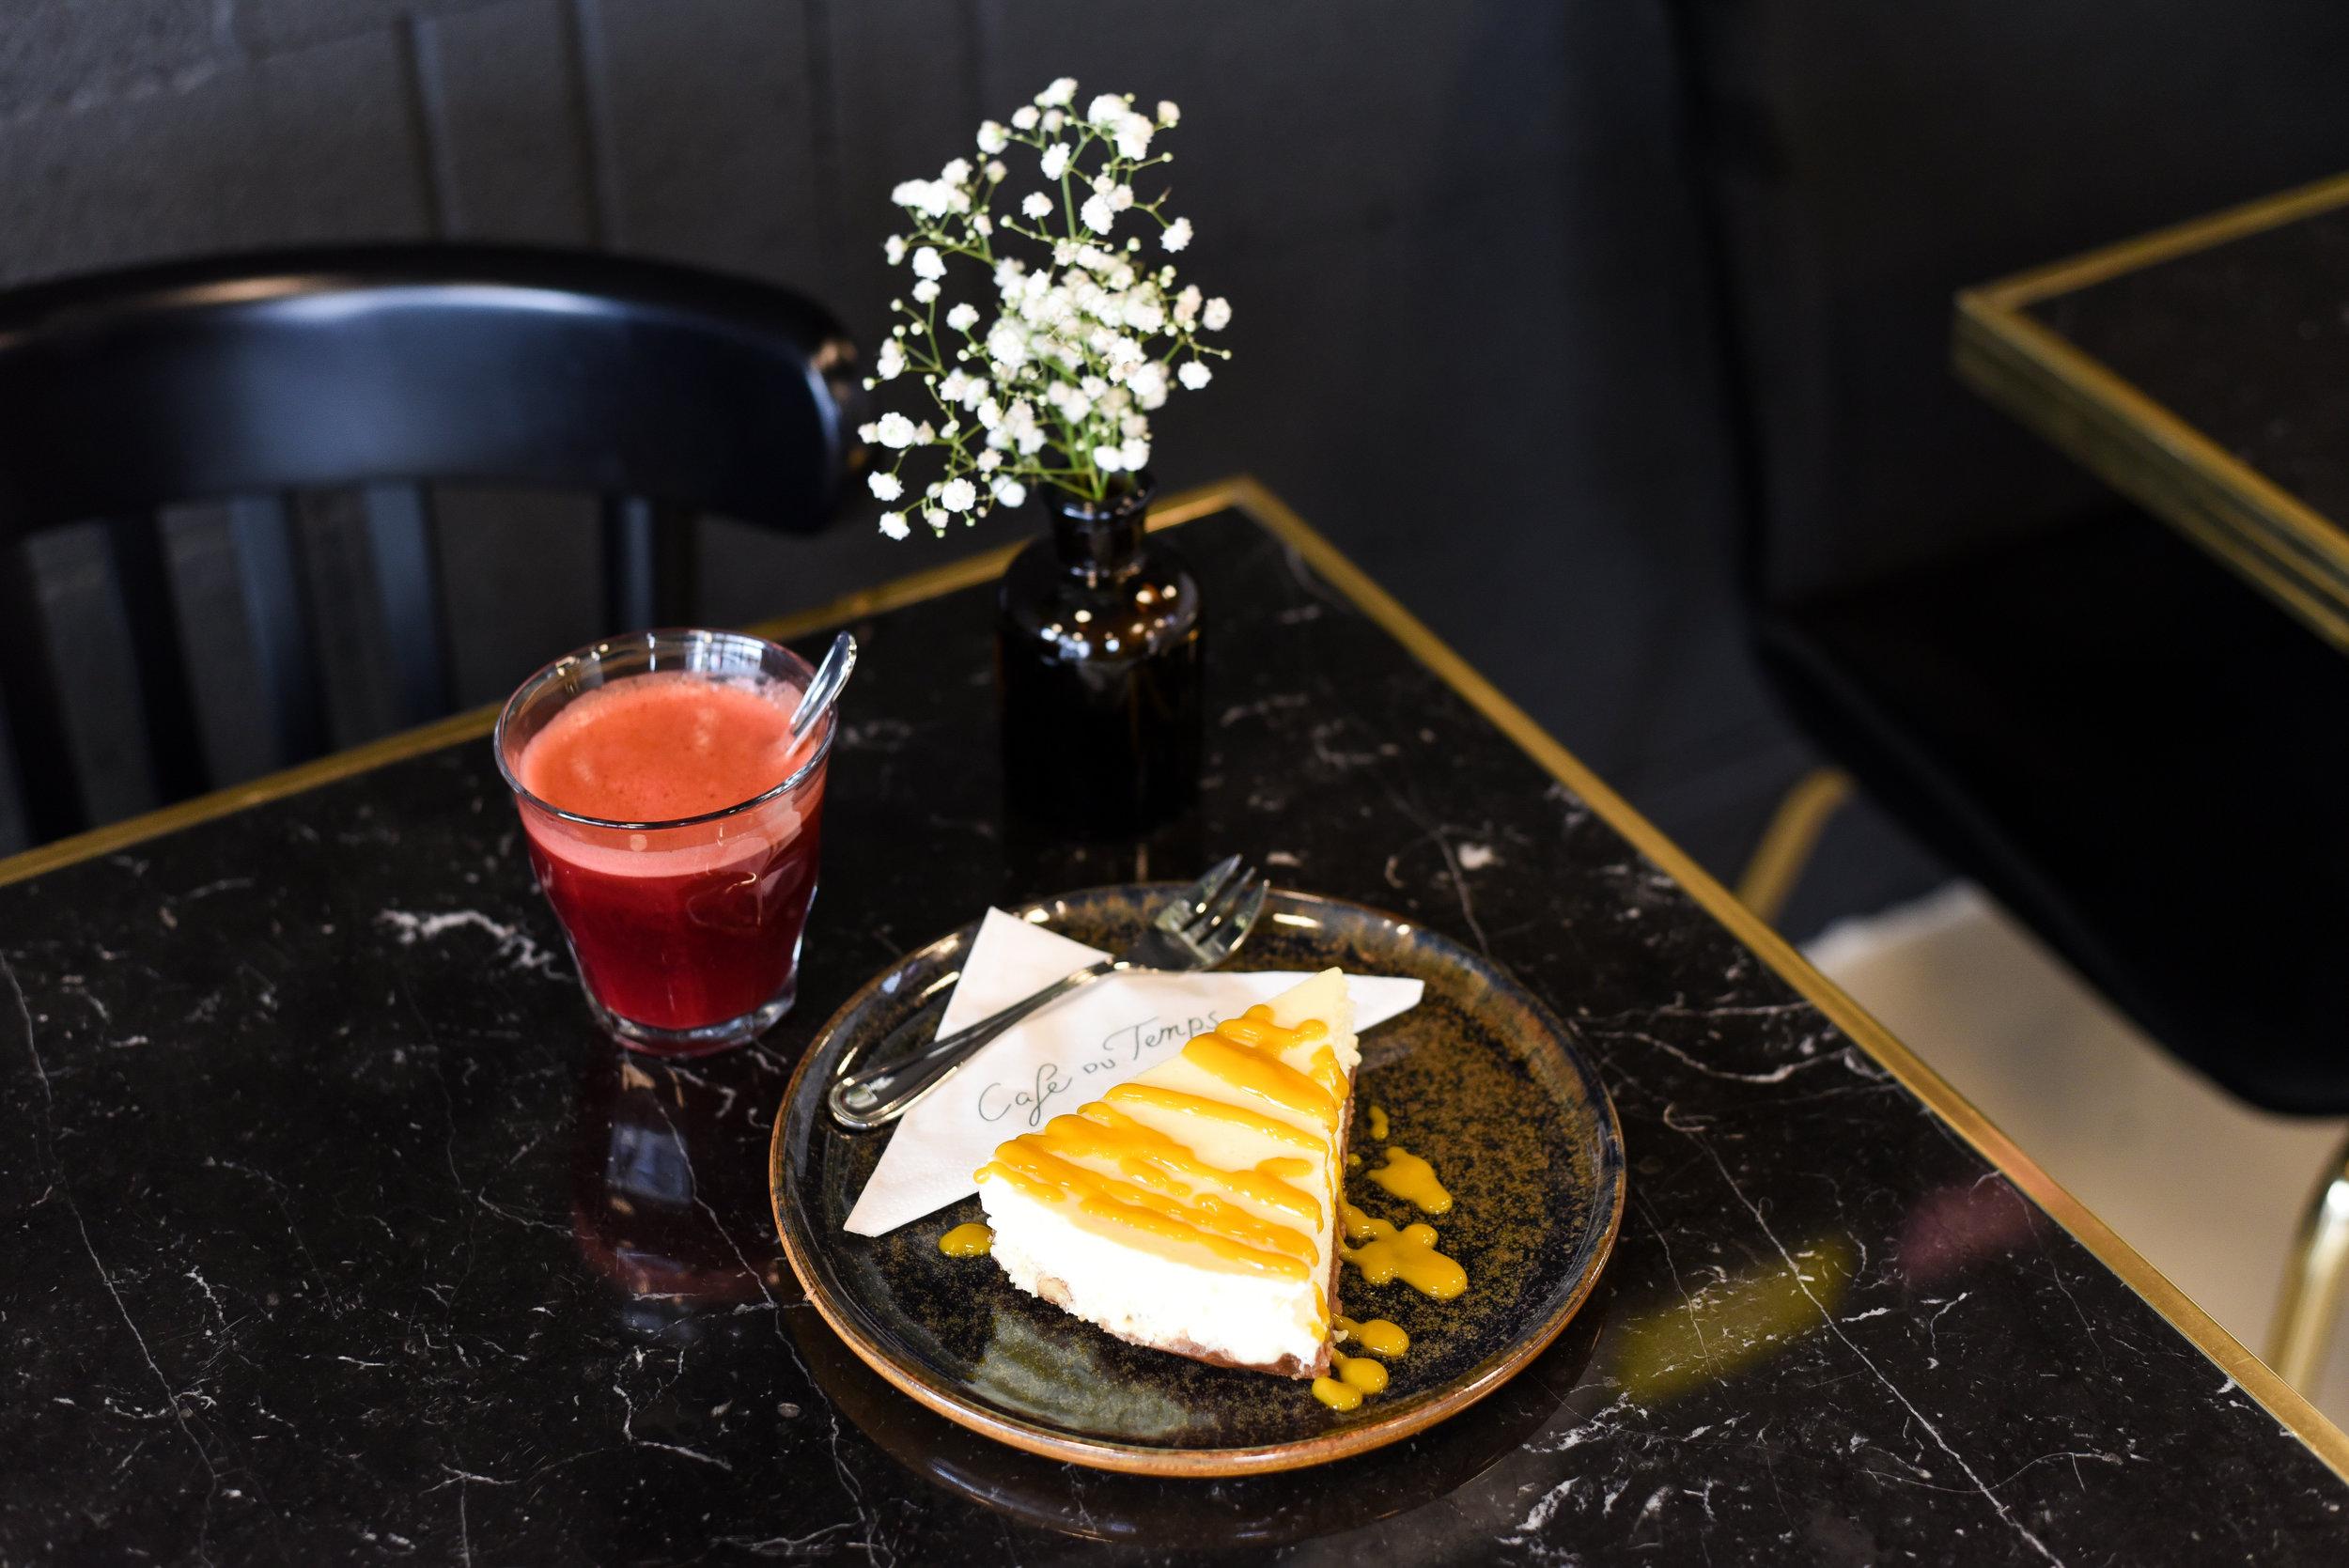 twinky-lizzy-blog-aix-en-provence-cafe-du-temps-restaurant-vegan-3.jpg